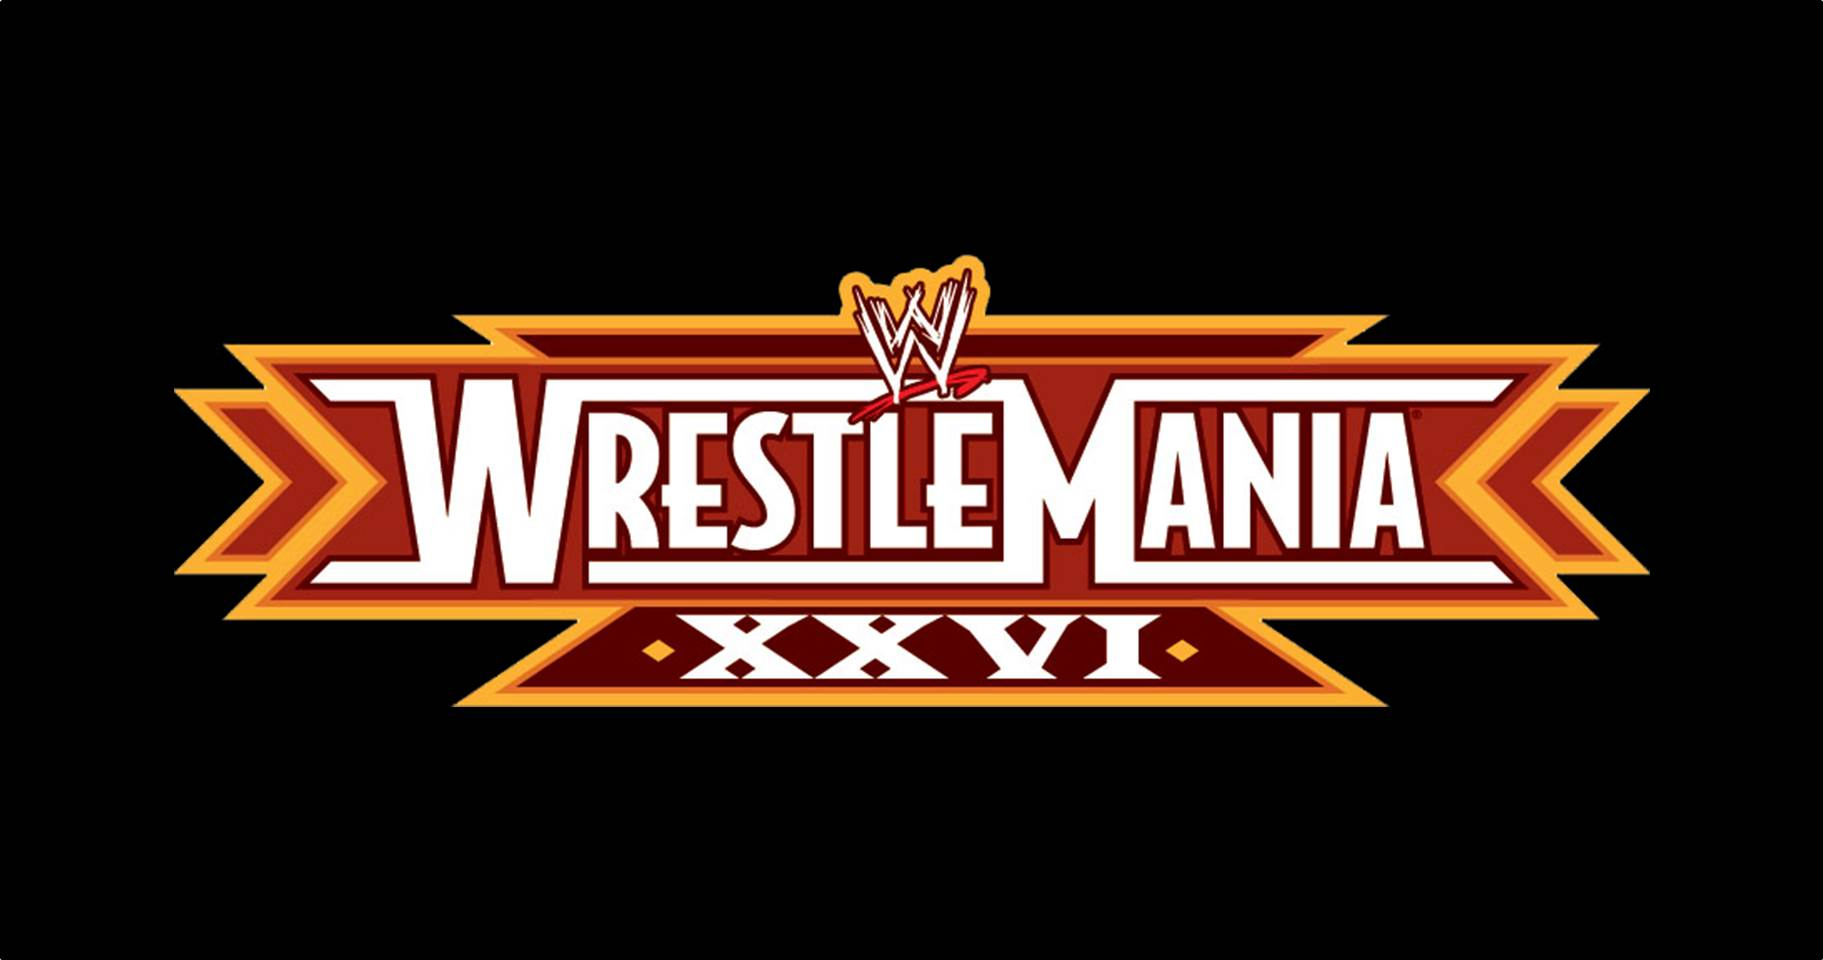 undertaker vs shawn michaels wrestlemania 26